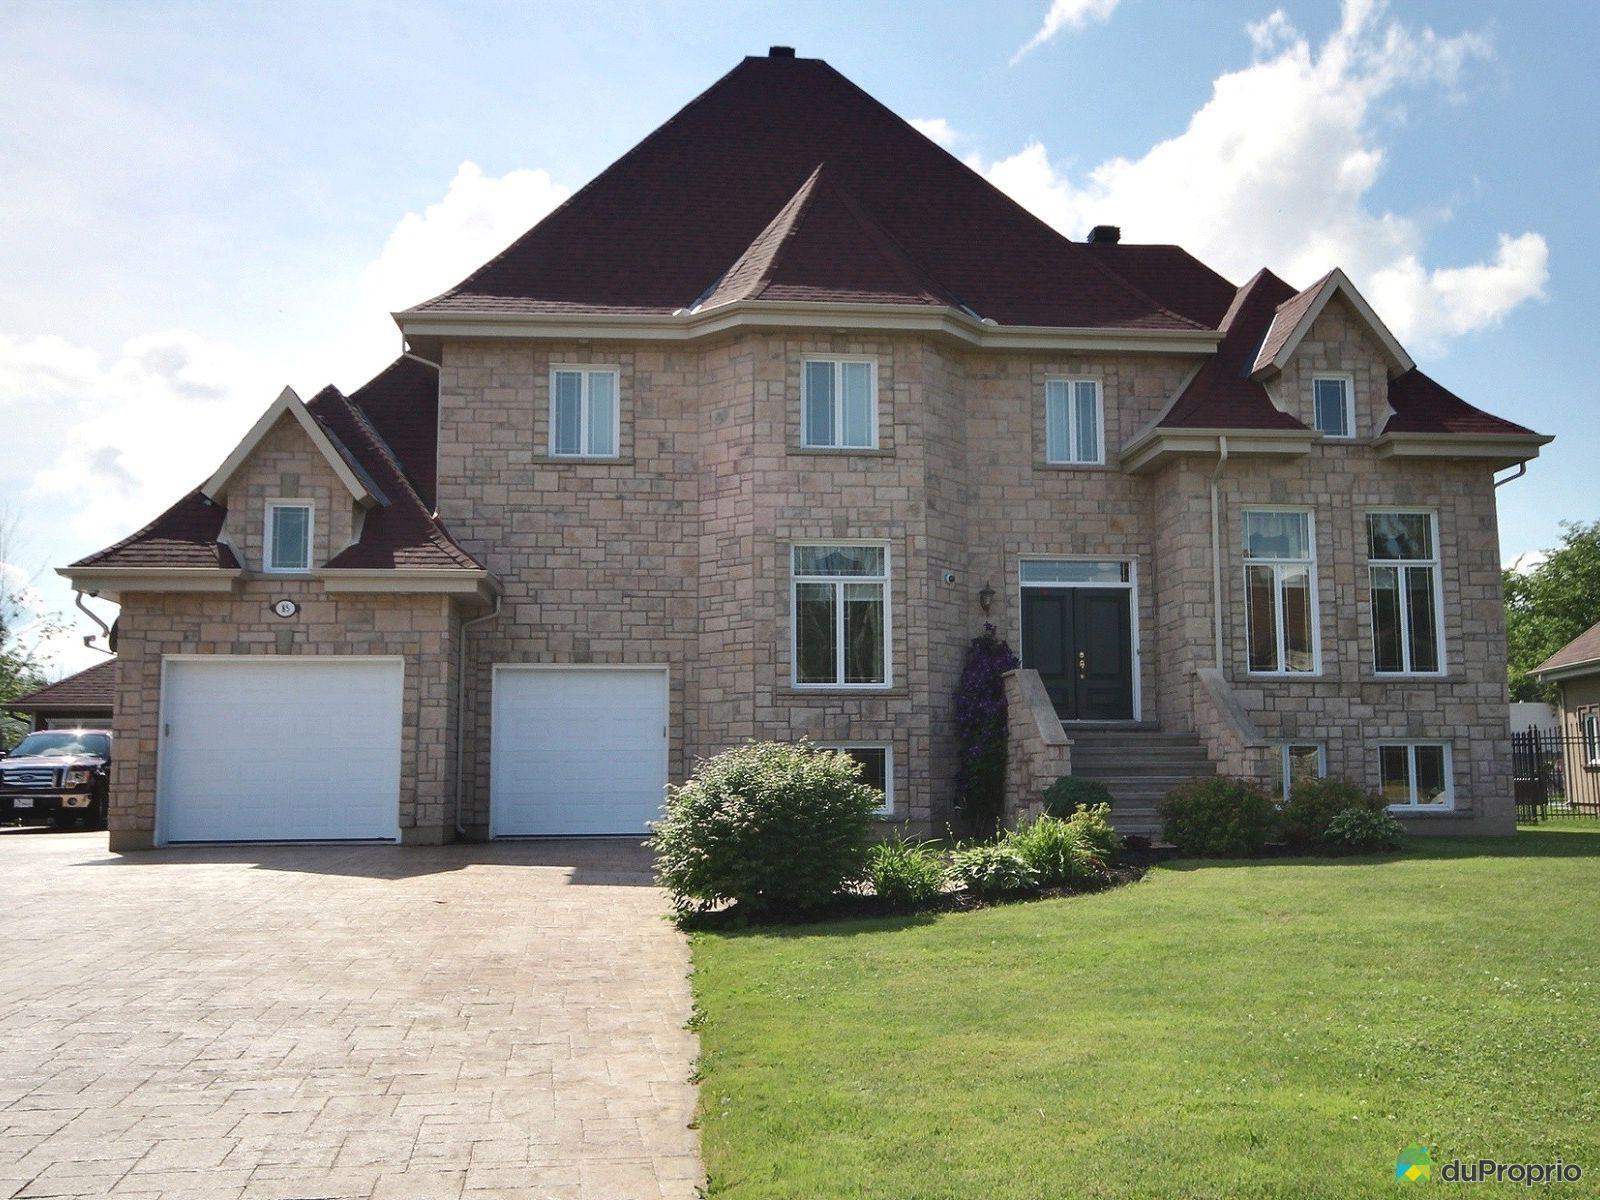 facade-maison-a-vendre-gatineau-aylmer-quebec-province-1600-6353708.jpg